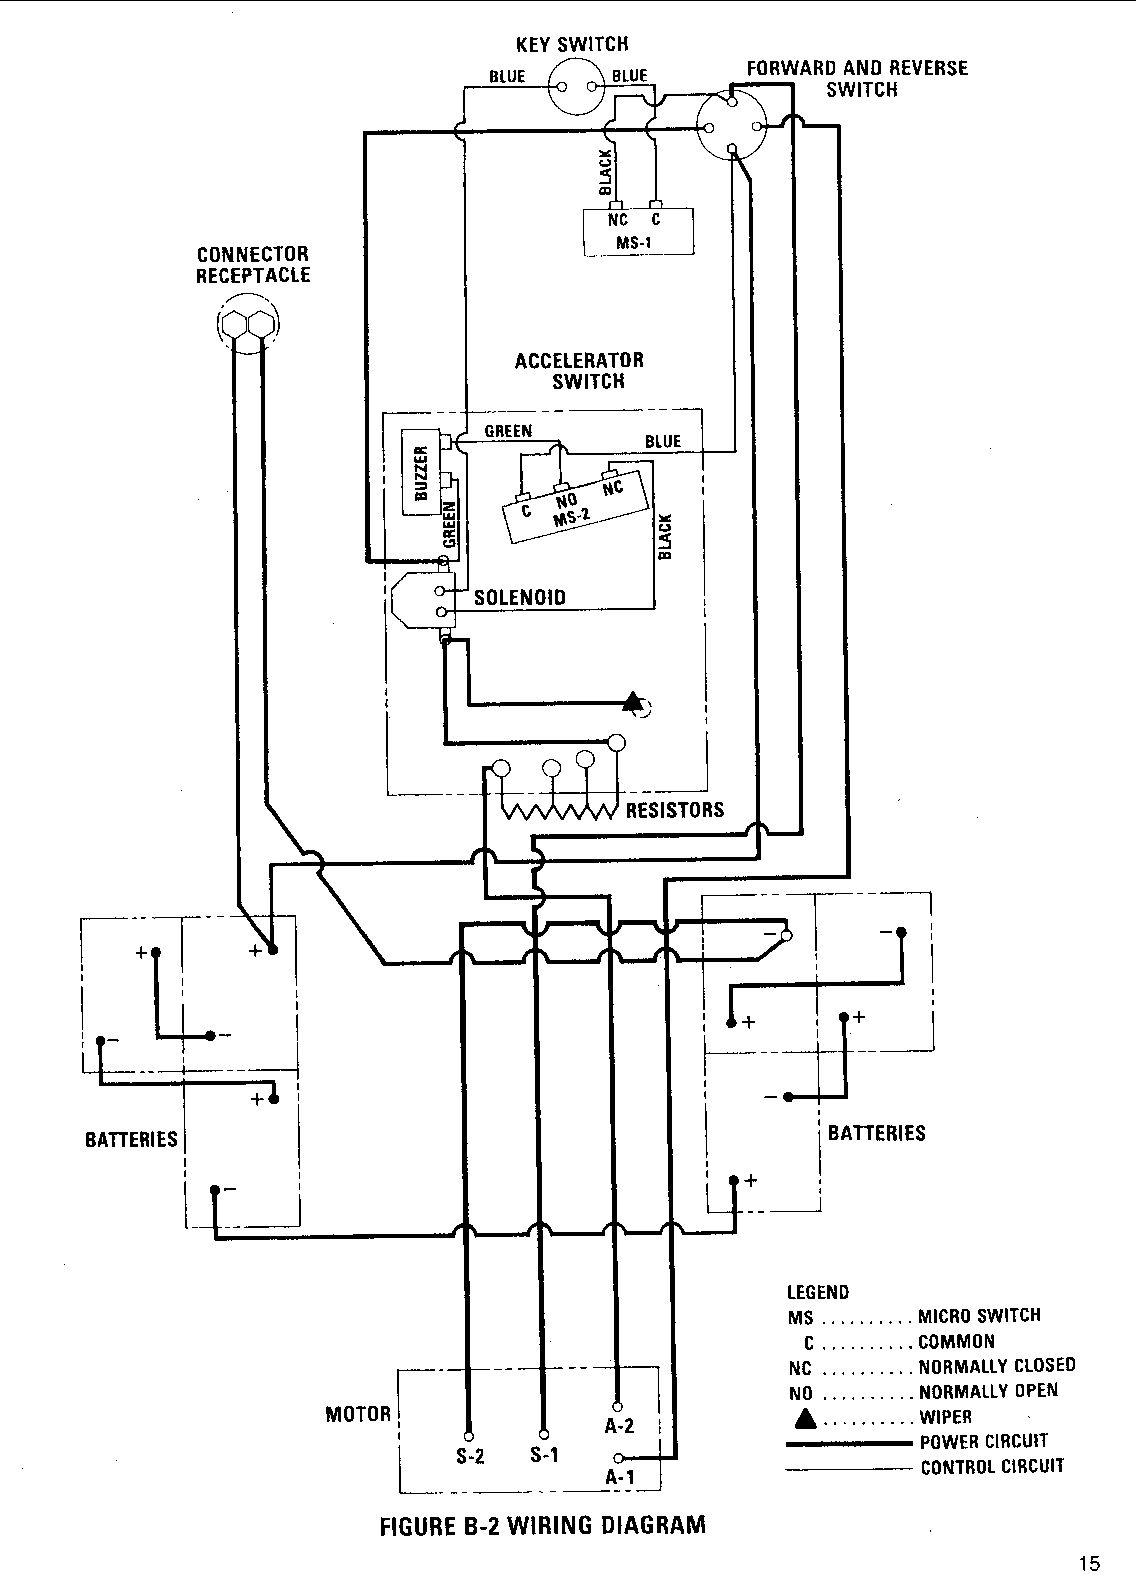 motrec wiring diagram new wiring diagram 2018 rh jppoker co Motrec Distributors motrec wiring diagram